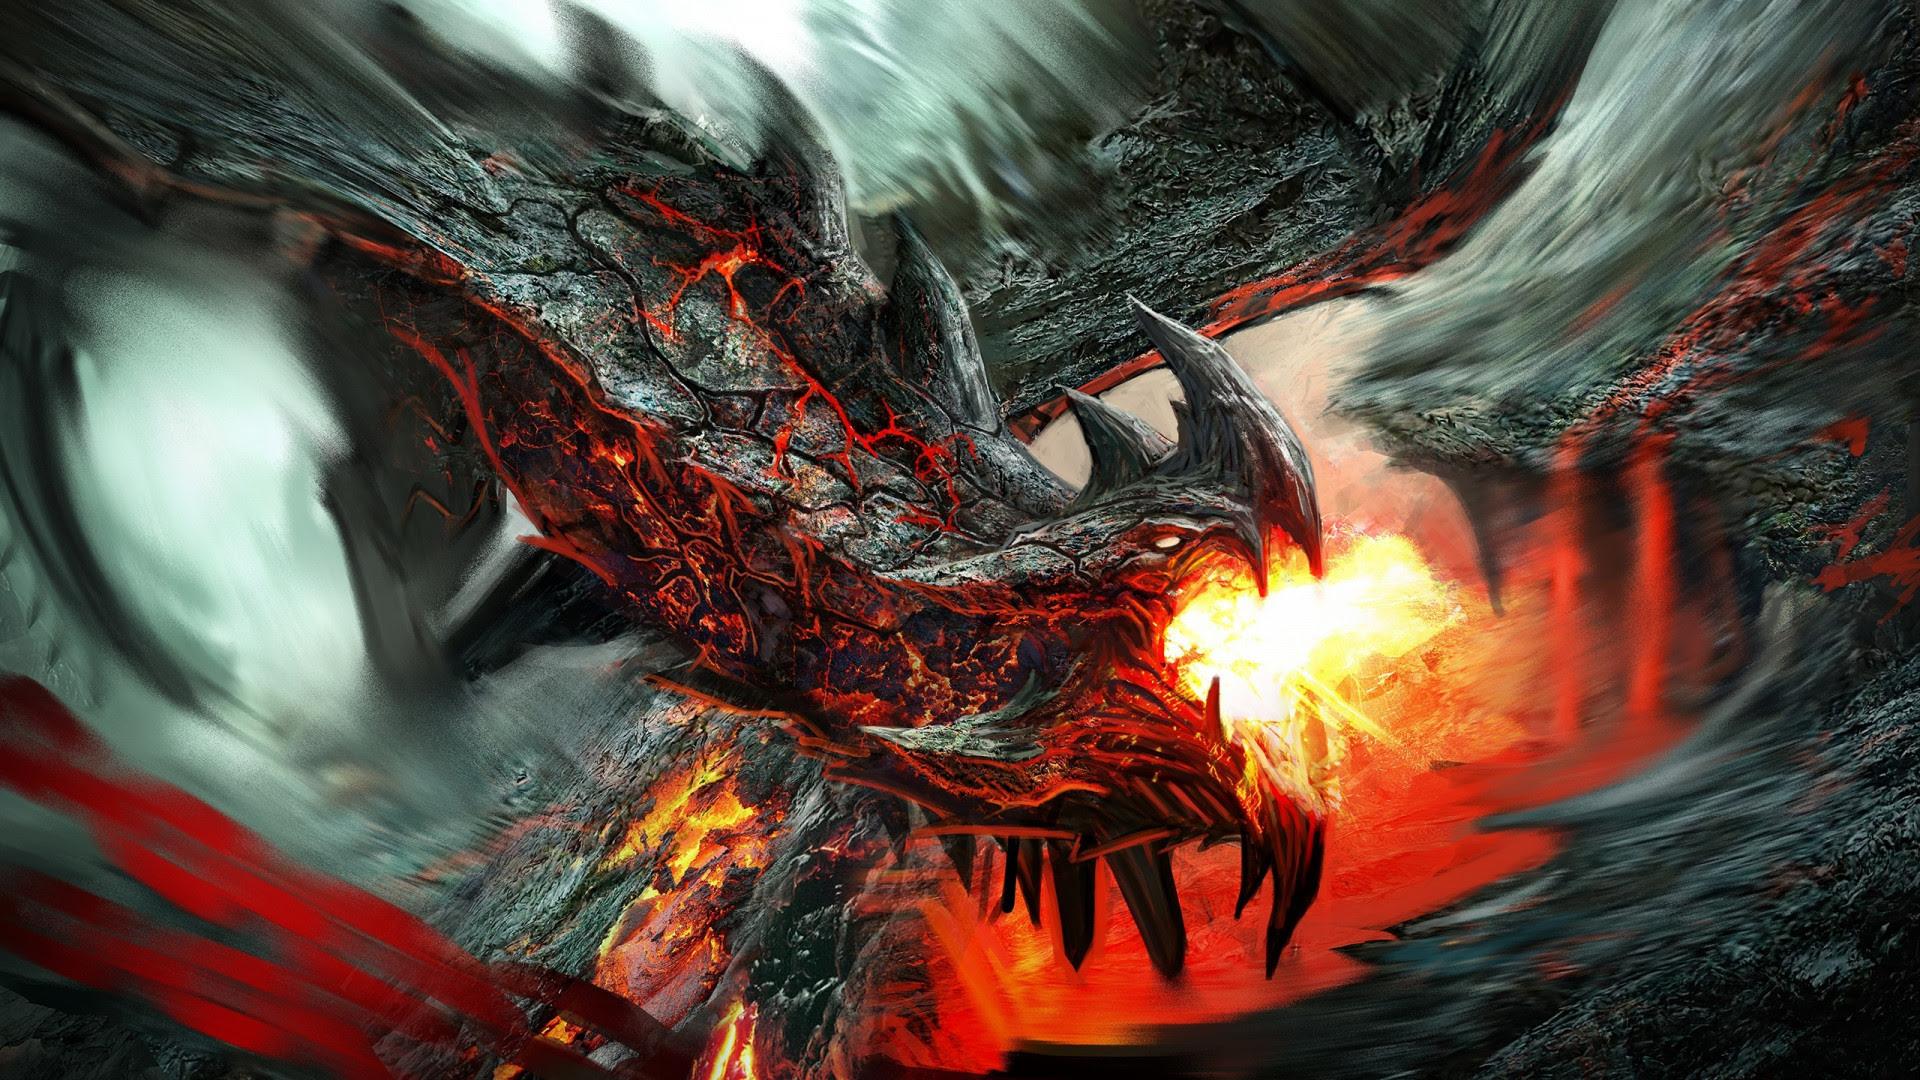 Dragon Wallpaper Hd 75 Images